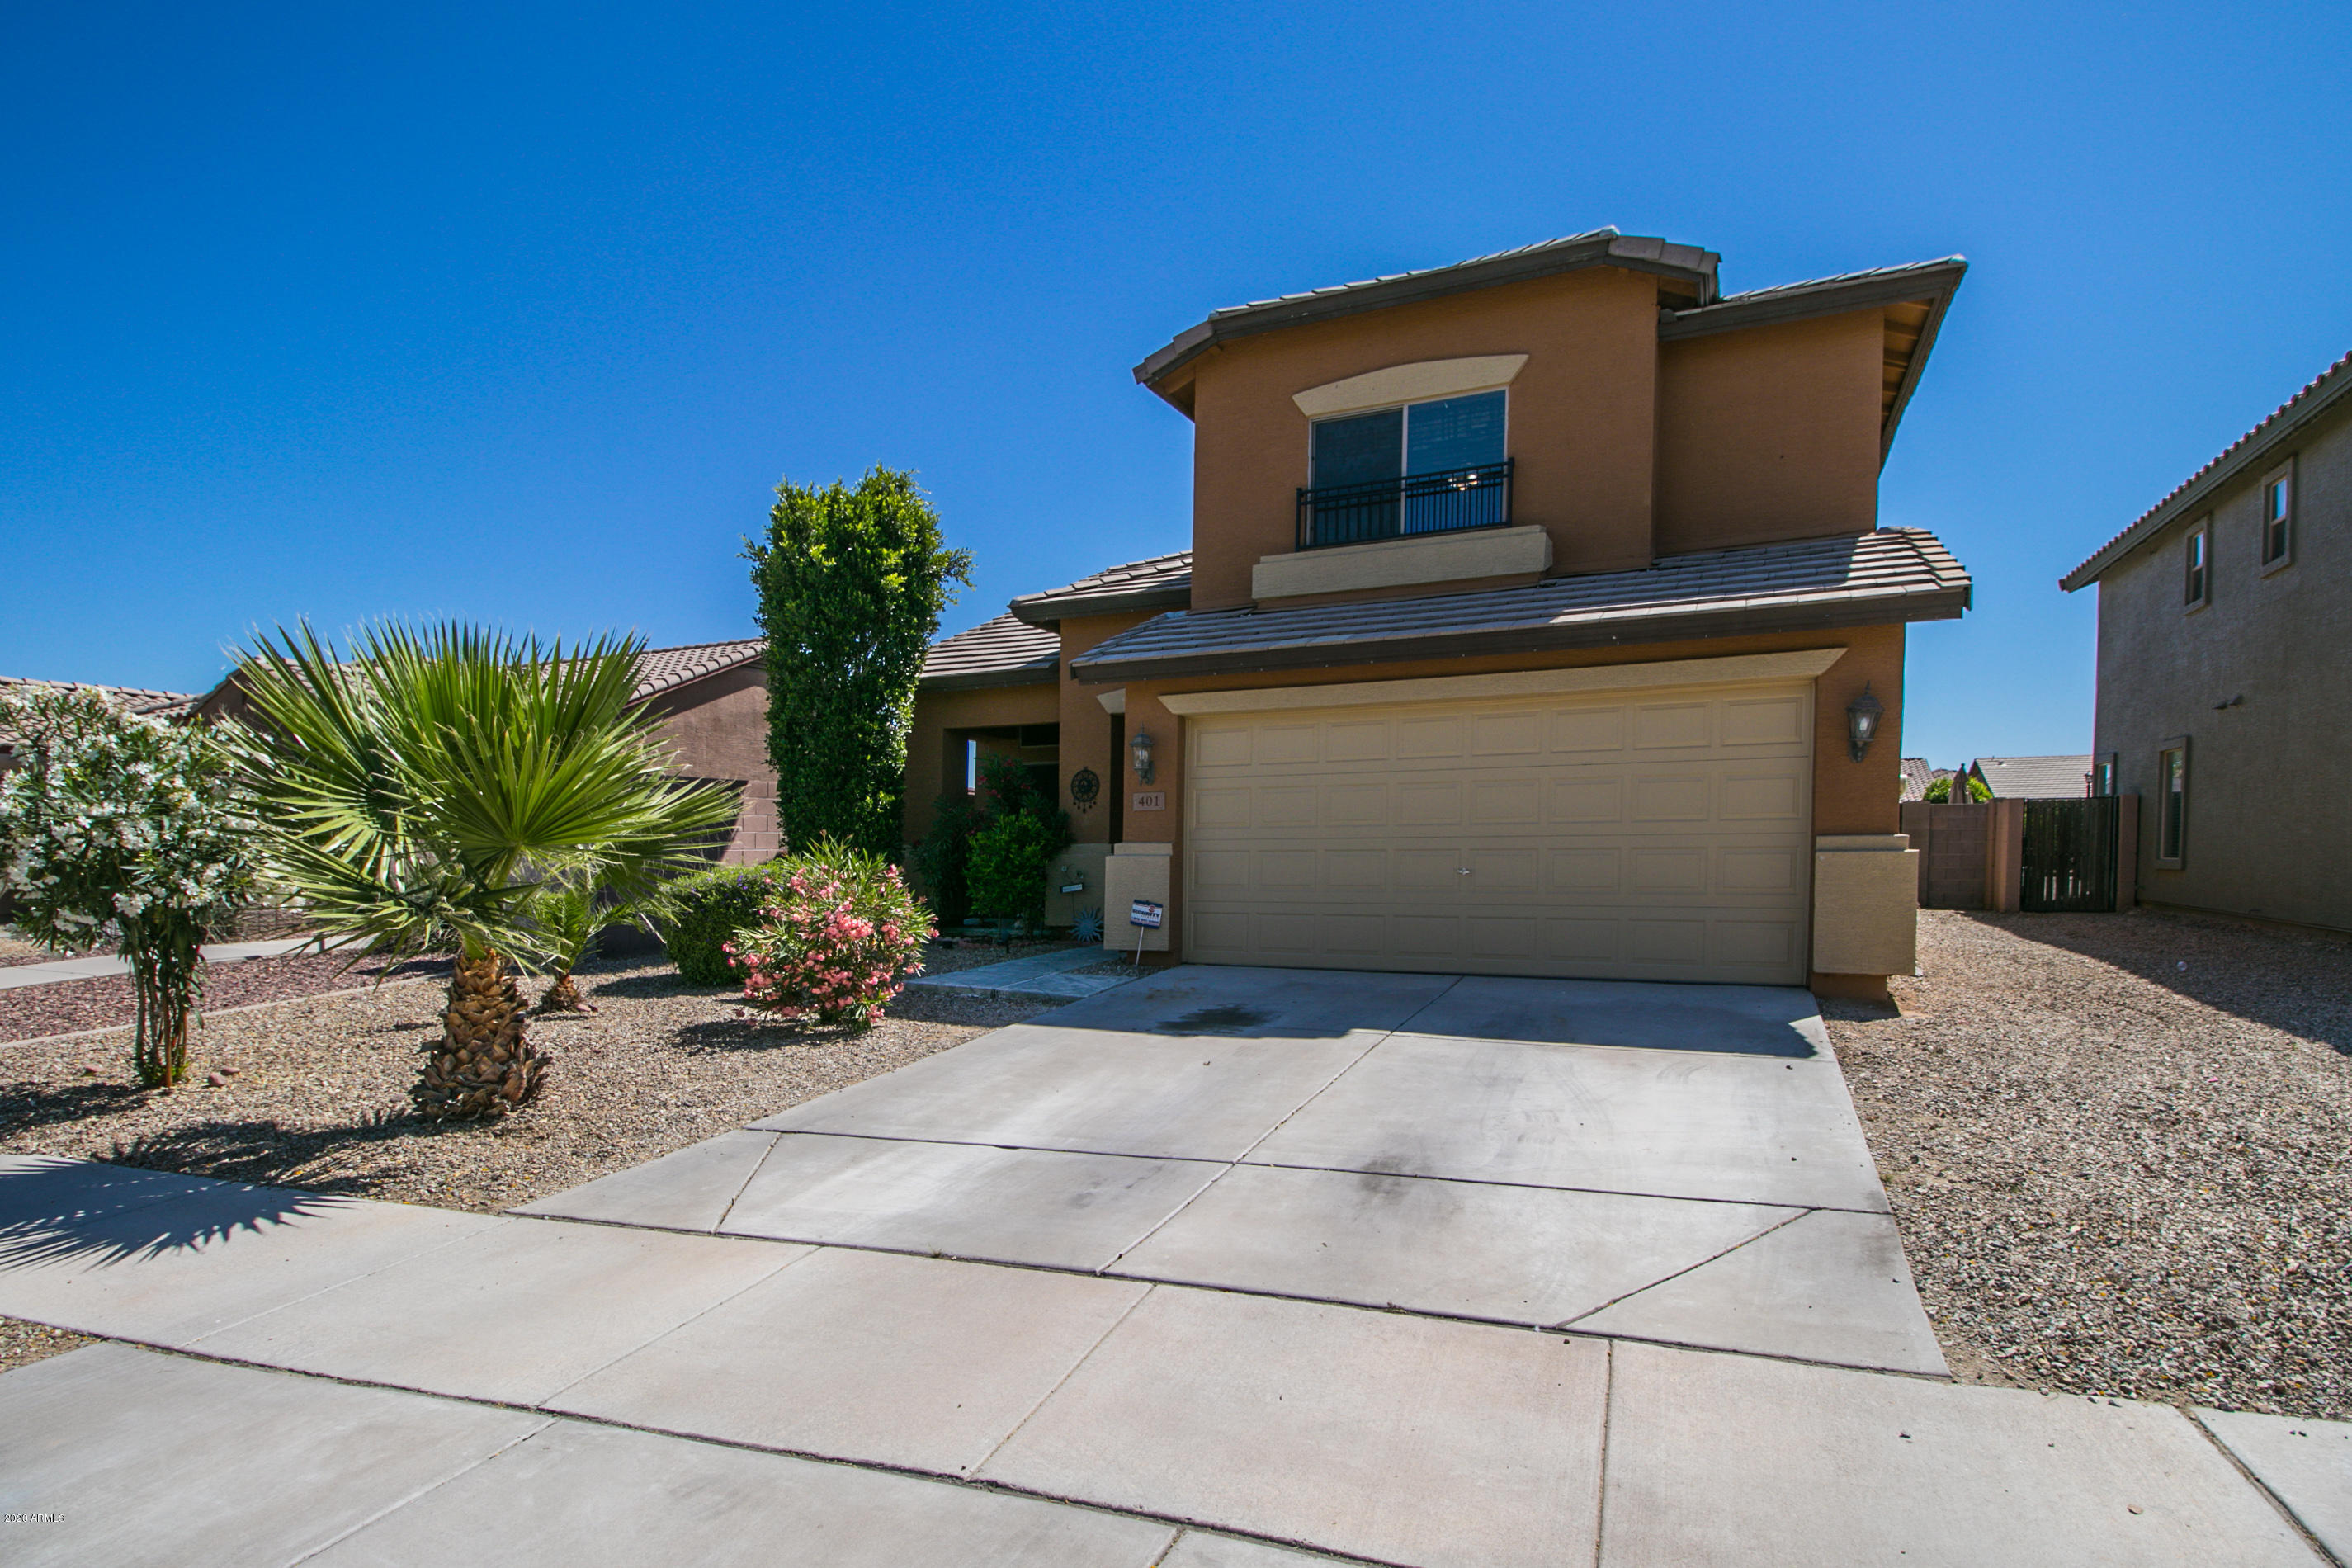 Photo of 401 S 112TH Drive, Avondale, AZ 85323